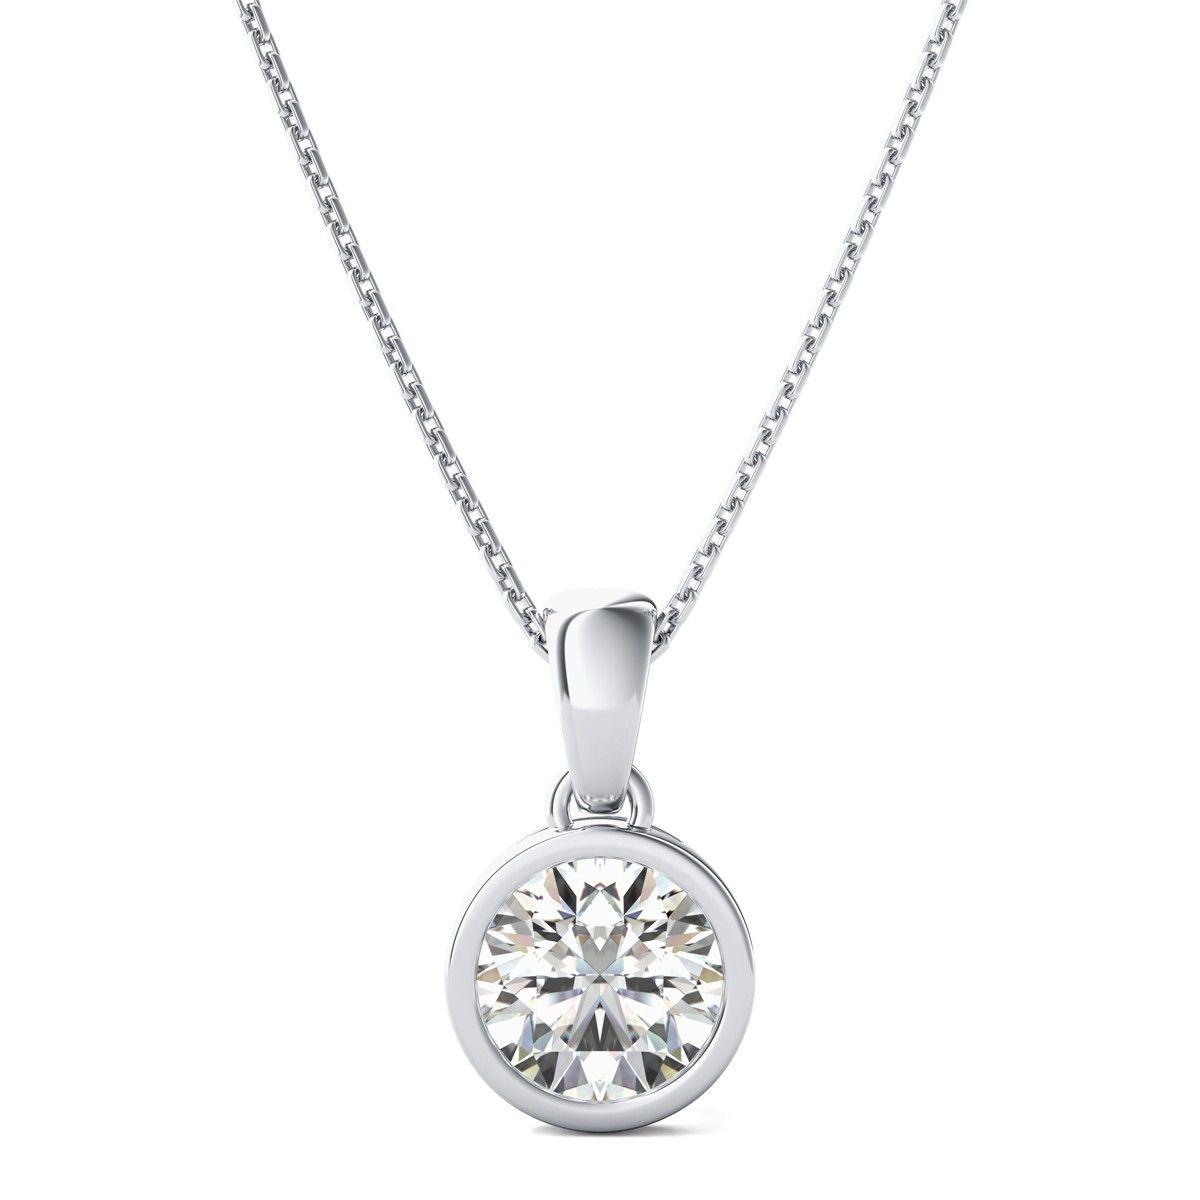 Bezel set solitaire pendant with round cut diamond by 90210jewelry bezel set solitaire pendant with round cut diamond by 90210jewelry aloadofball Choice Image